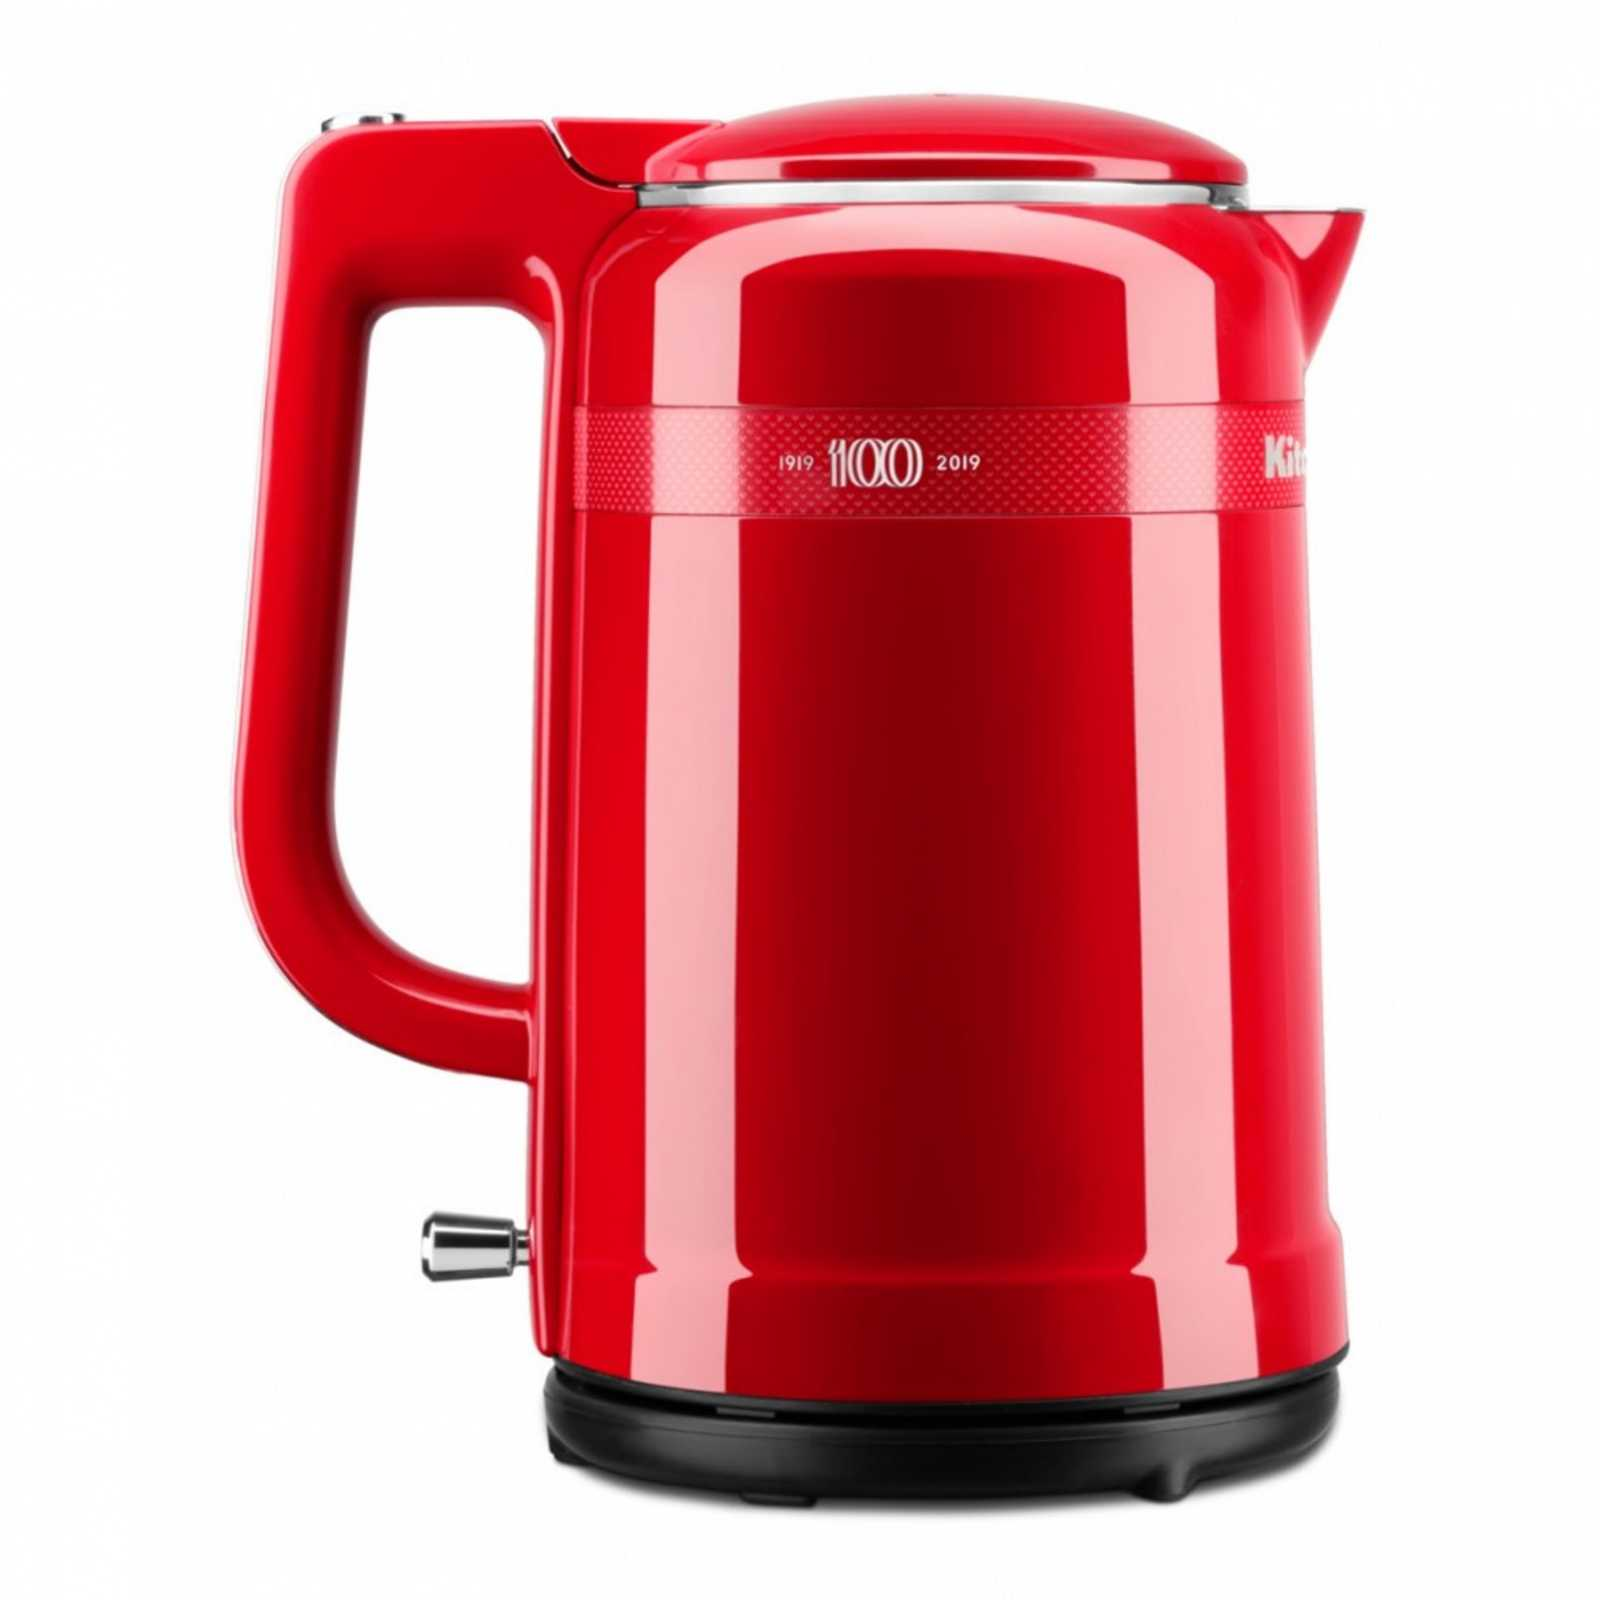 Онлайн каталог PROMENU: Электрочайник KitchenAid Design Queen of Hearts, объем 1,5 л, 26х22х15 см, чувственный красный                               5KEK1565HESD